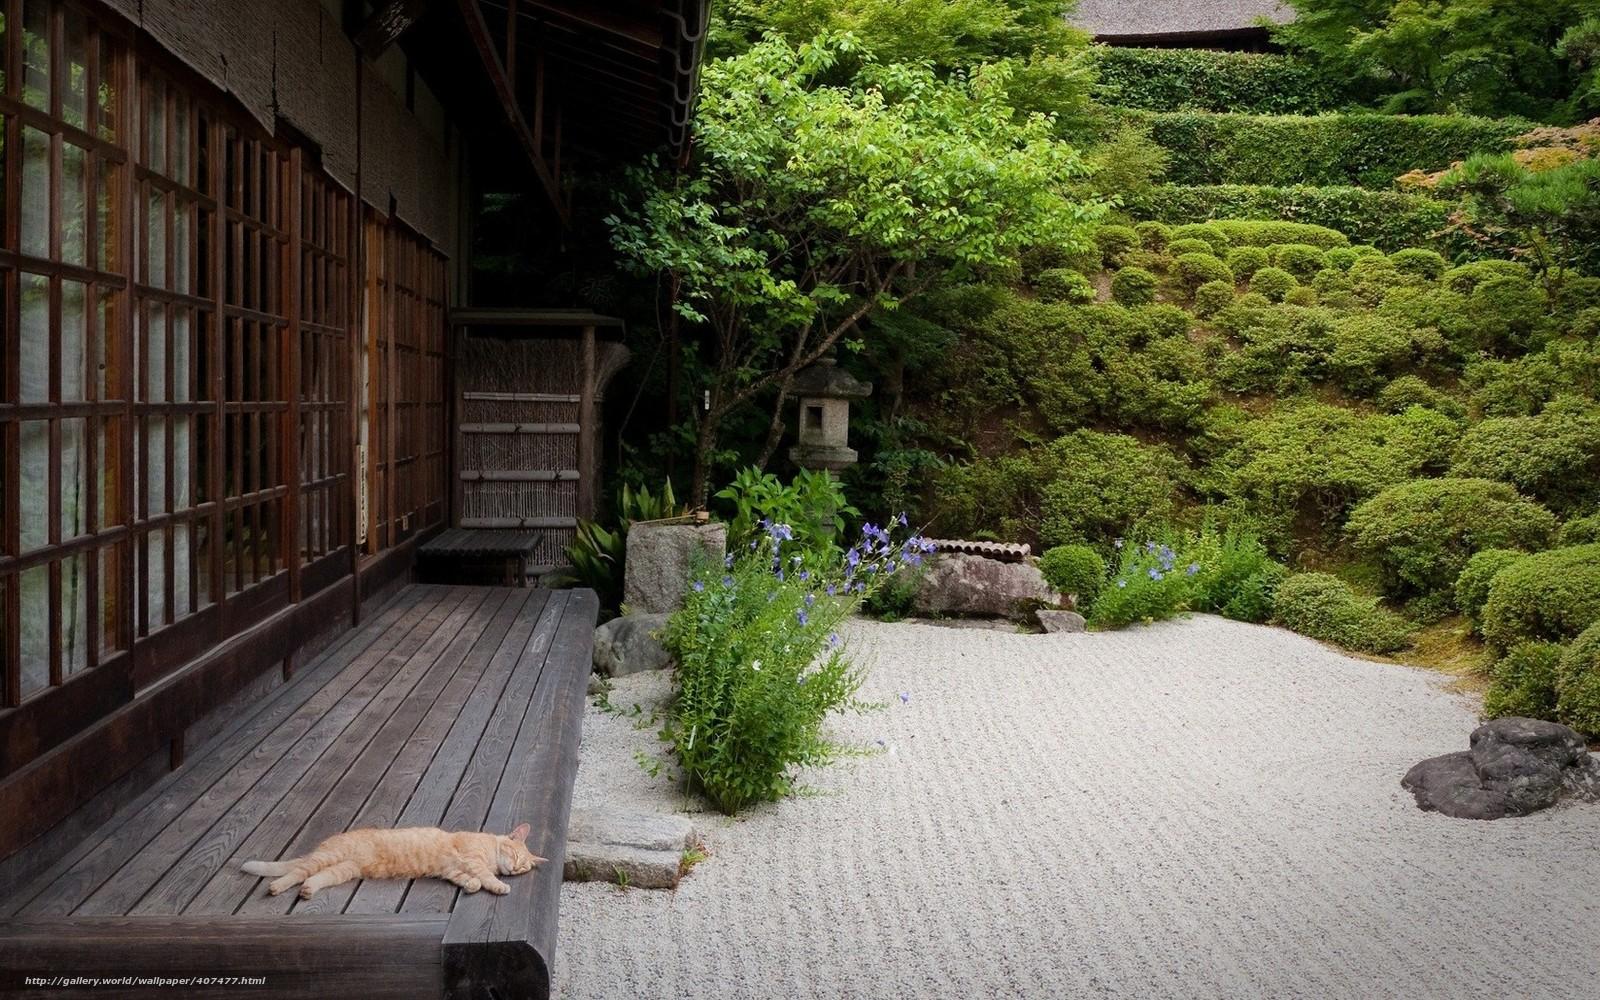 tlcharger fond d 39 ecran japon maison jardin patio fonds. Black Bedroom Furniture Sets. Home Design Ideas